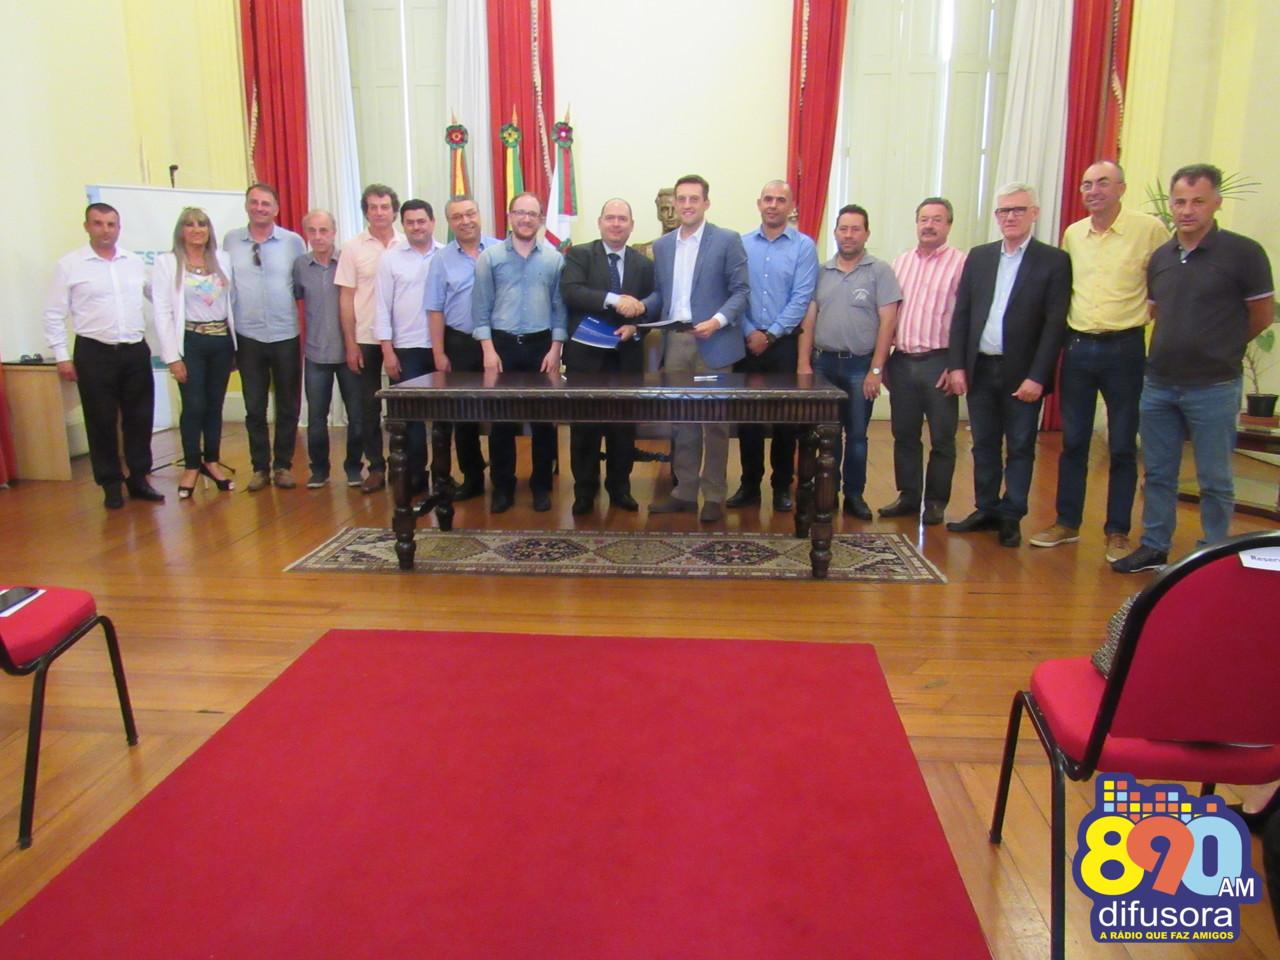 Prefeitura de Bento assina repasse de verbas de emendas parlamentares para o município